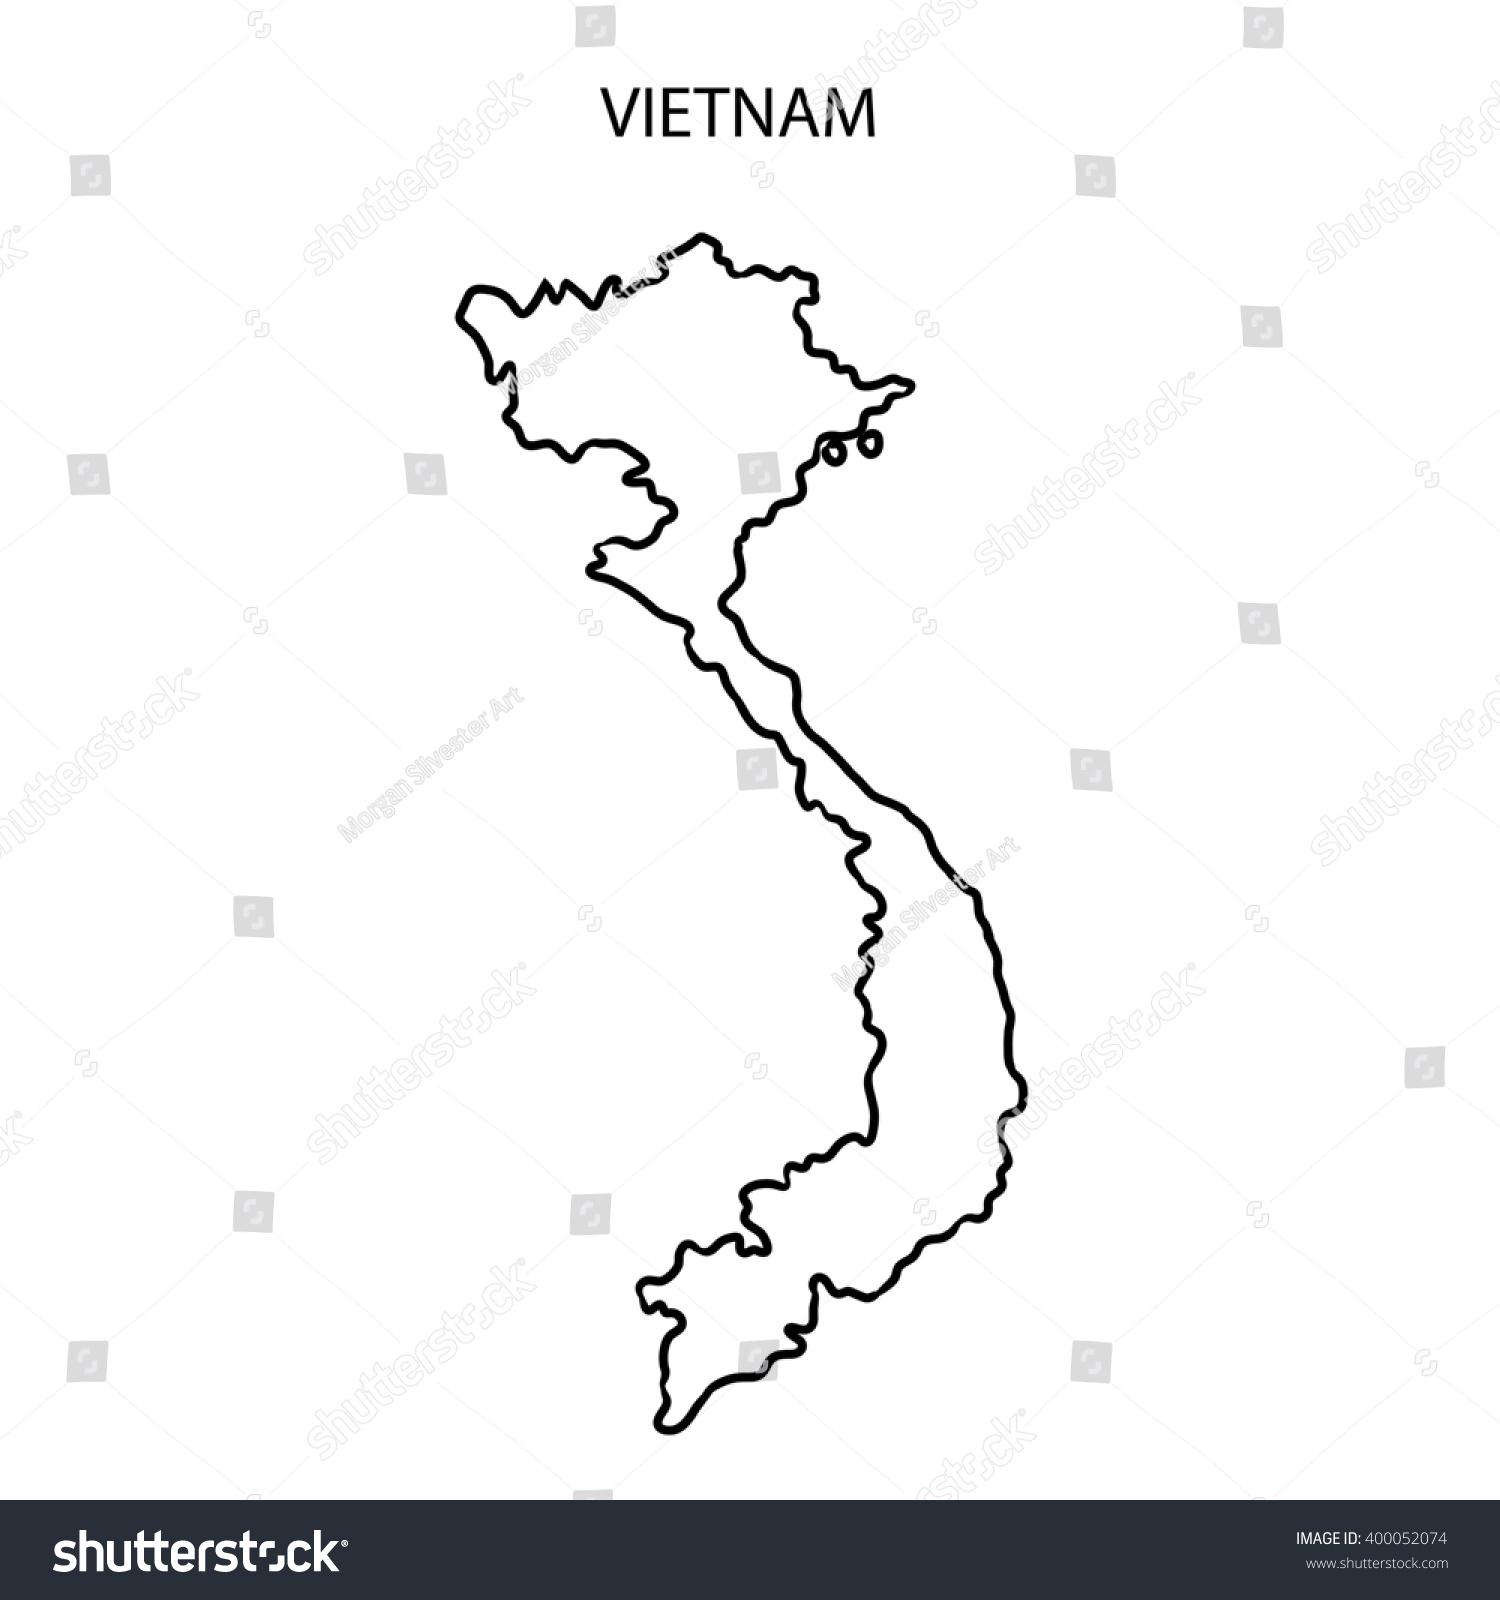 Vietnam Map Outline Stock Illustration Shutterstock - Vietnam map outline